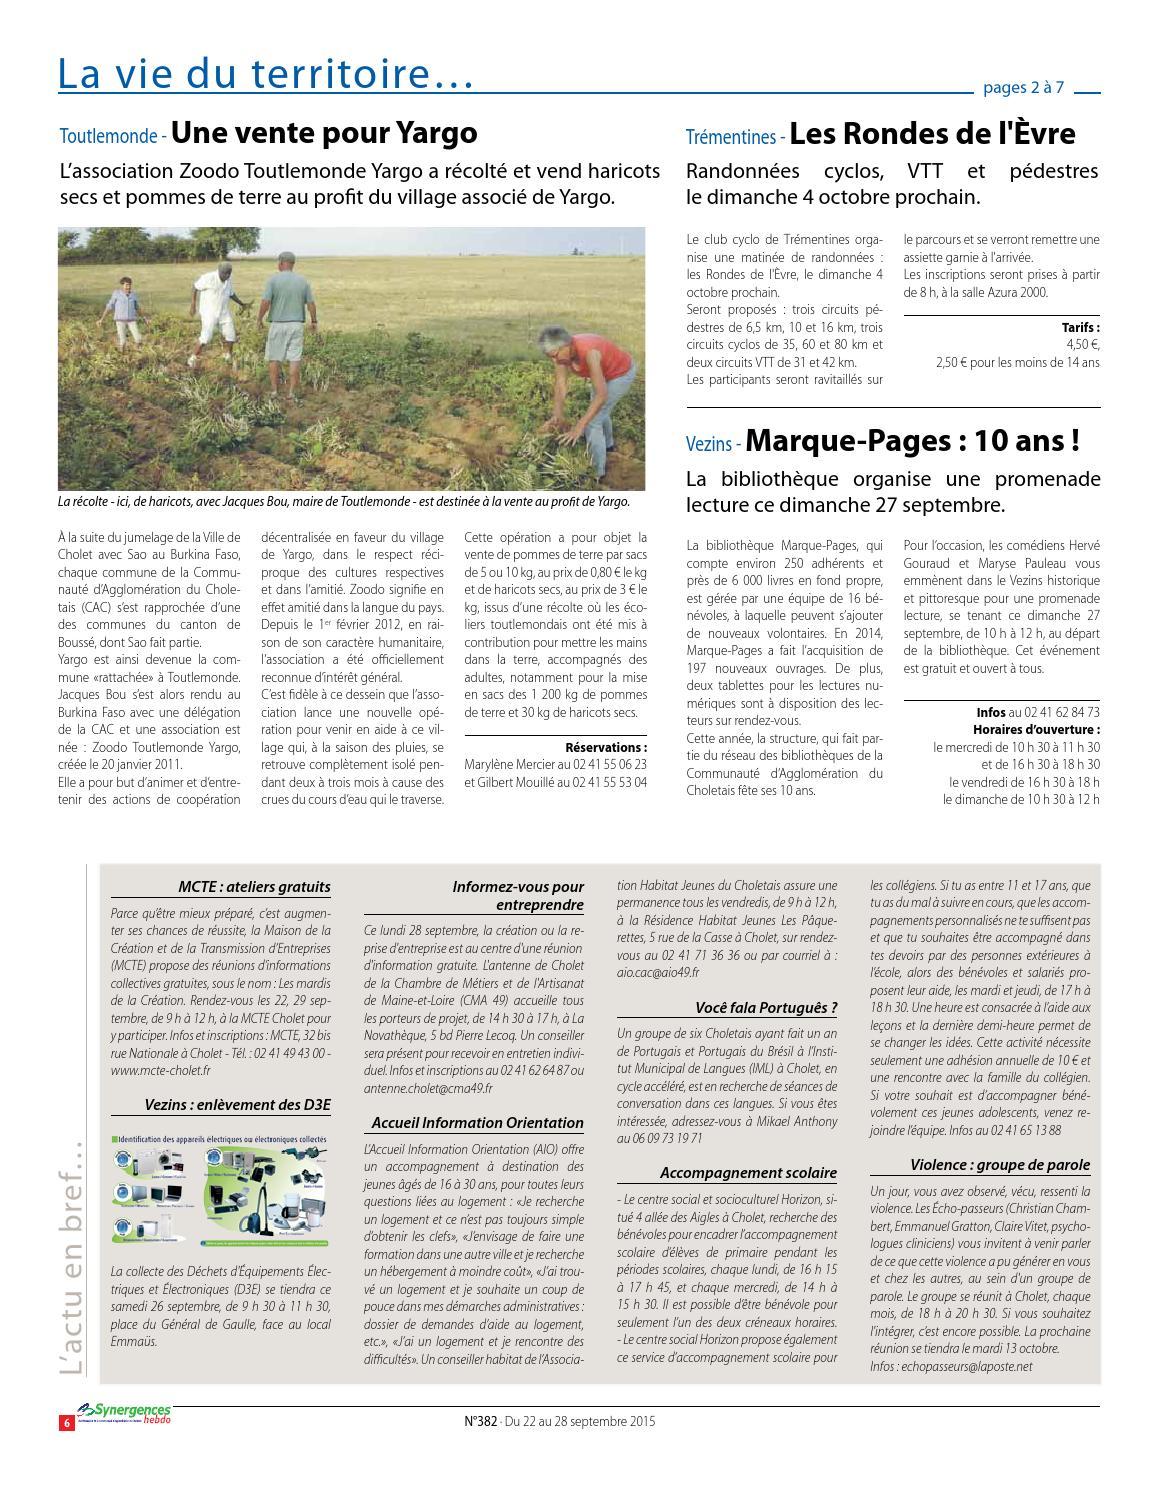 synergences hebdo n°382 by agglomération du choletais - issuu